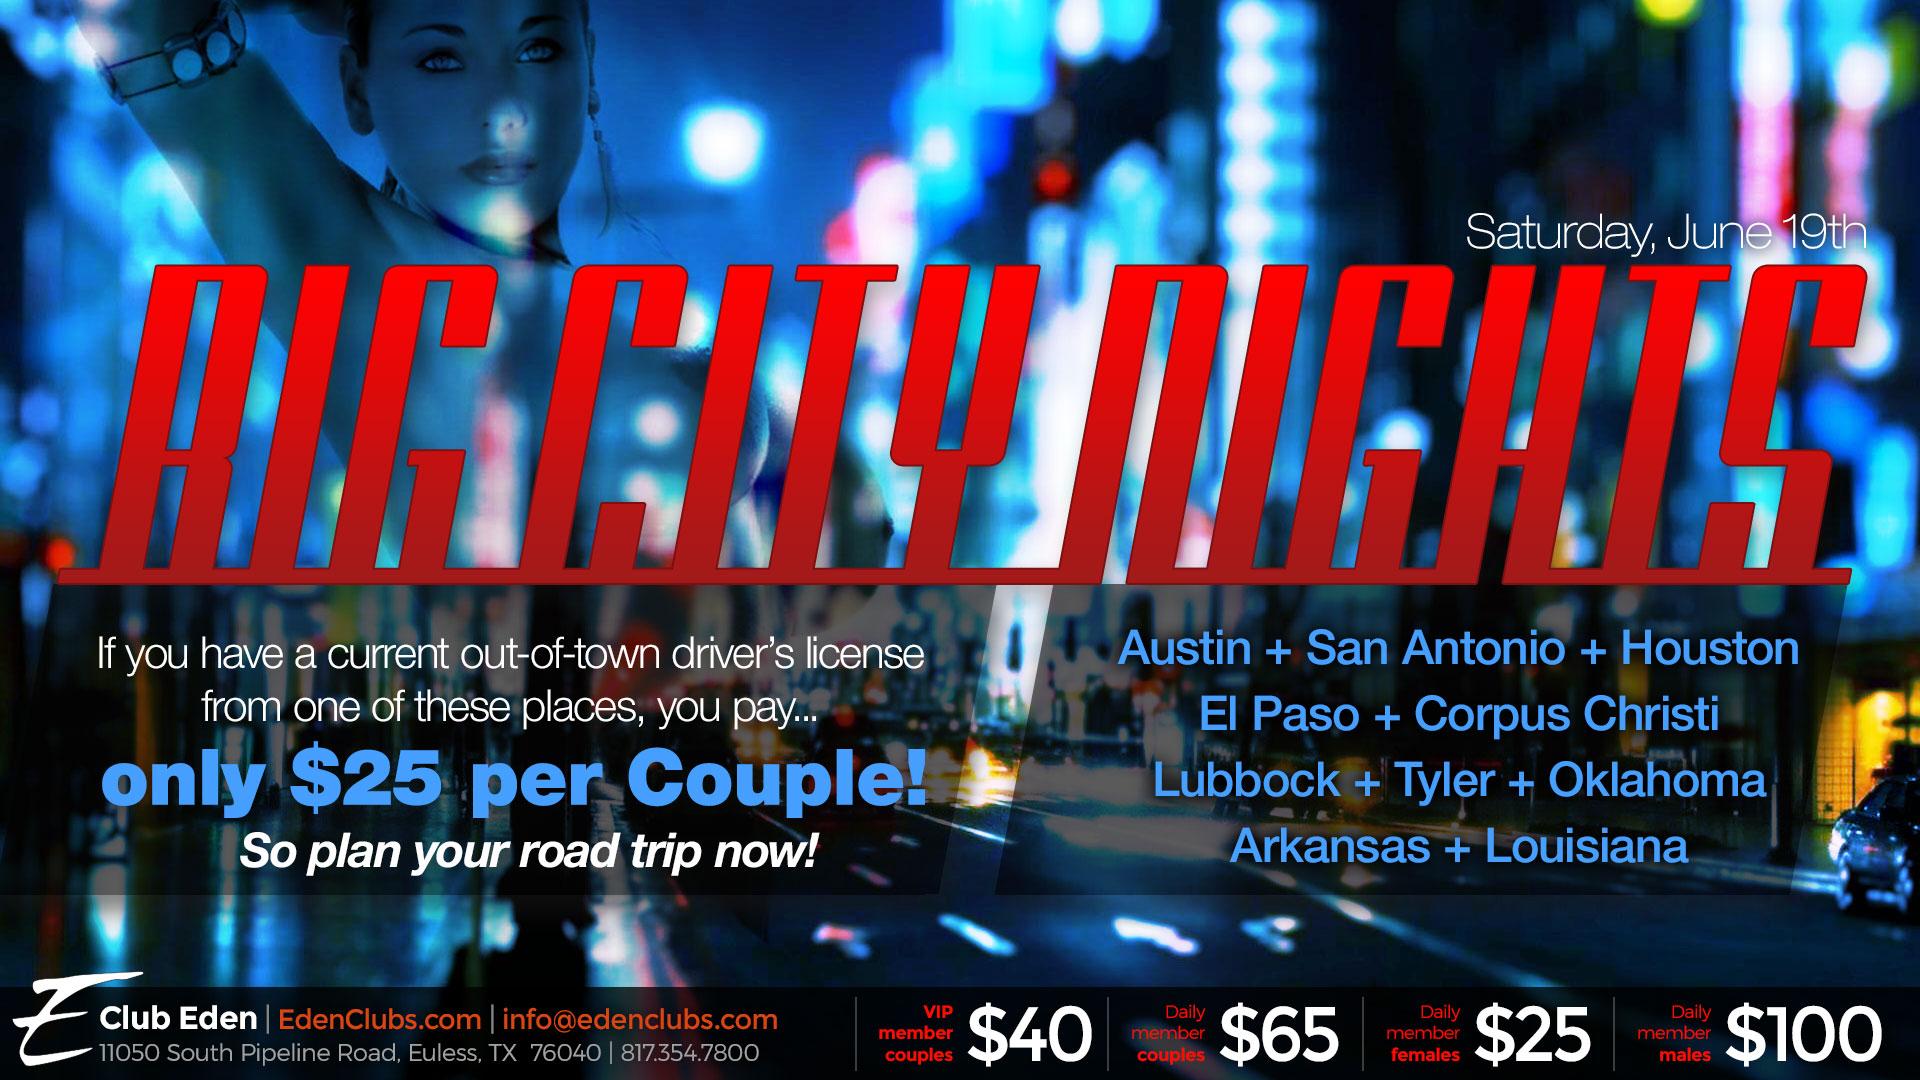 061921-Big-City-Nights-eden-dfw-tv